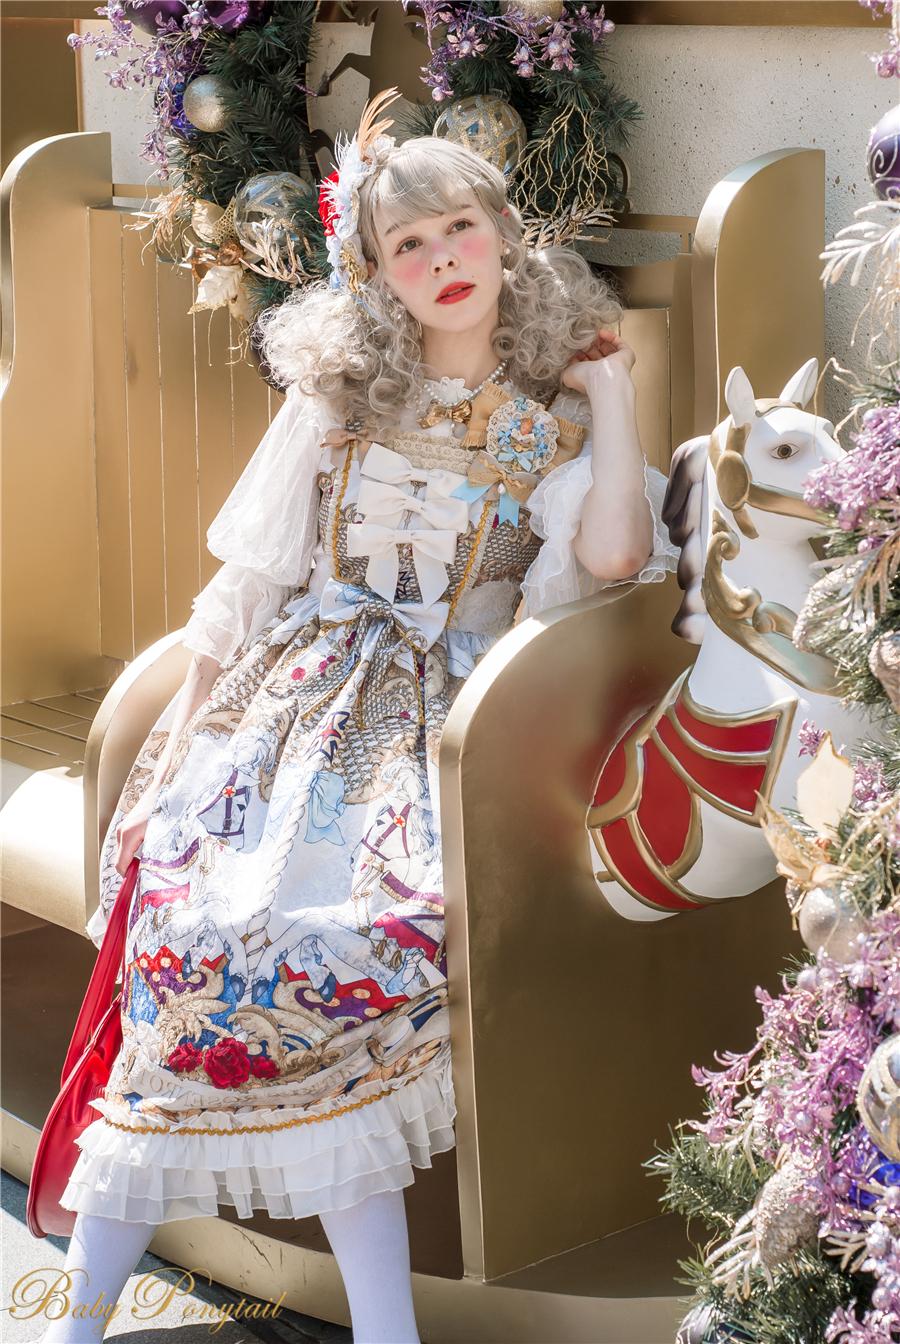 Baby Ponytail_Circus Princess_Silver JSK_Claudia27.jpg